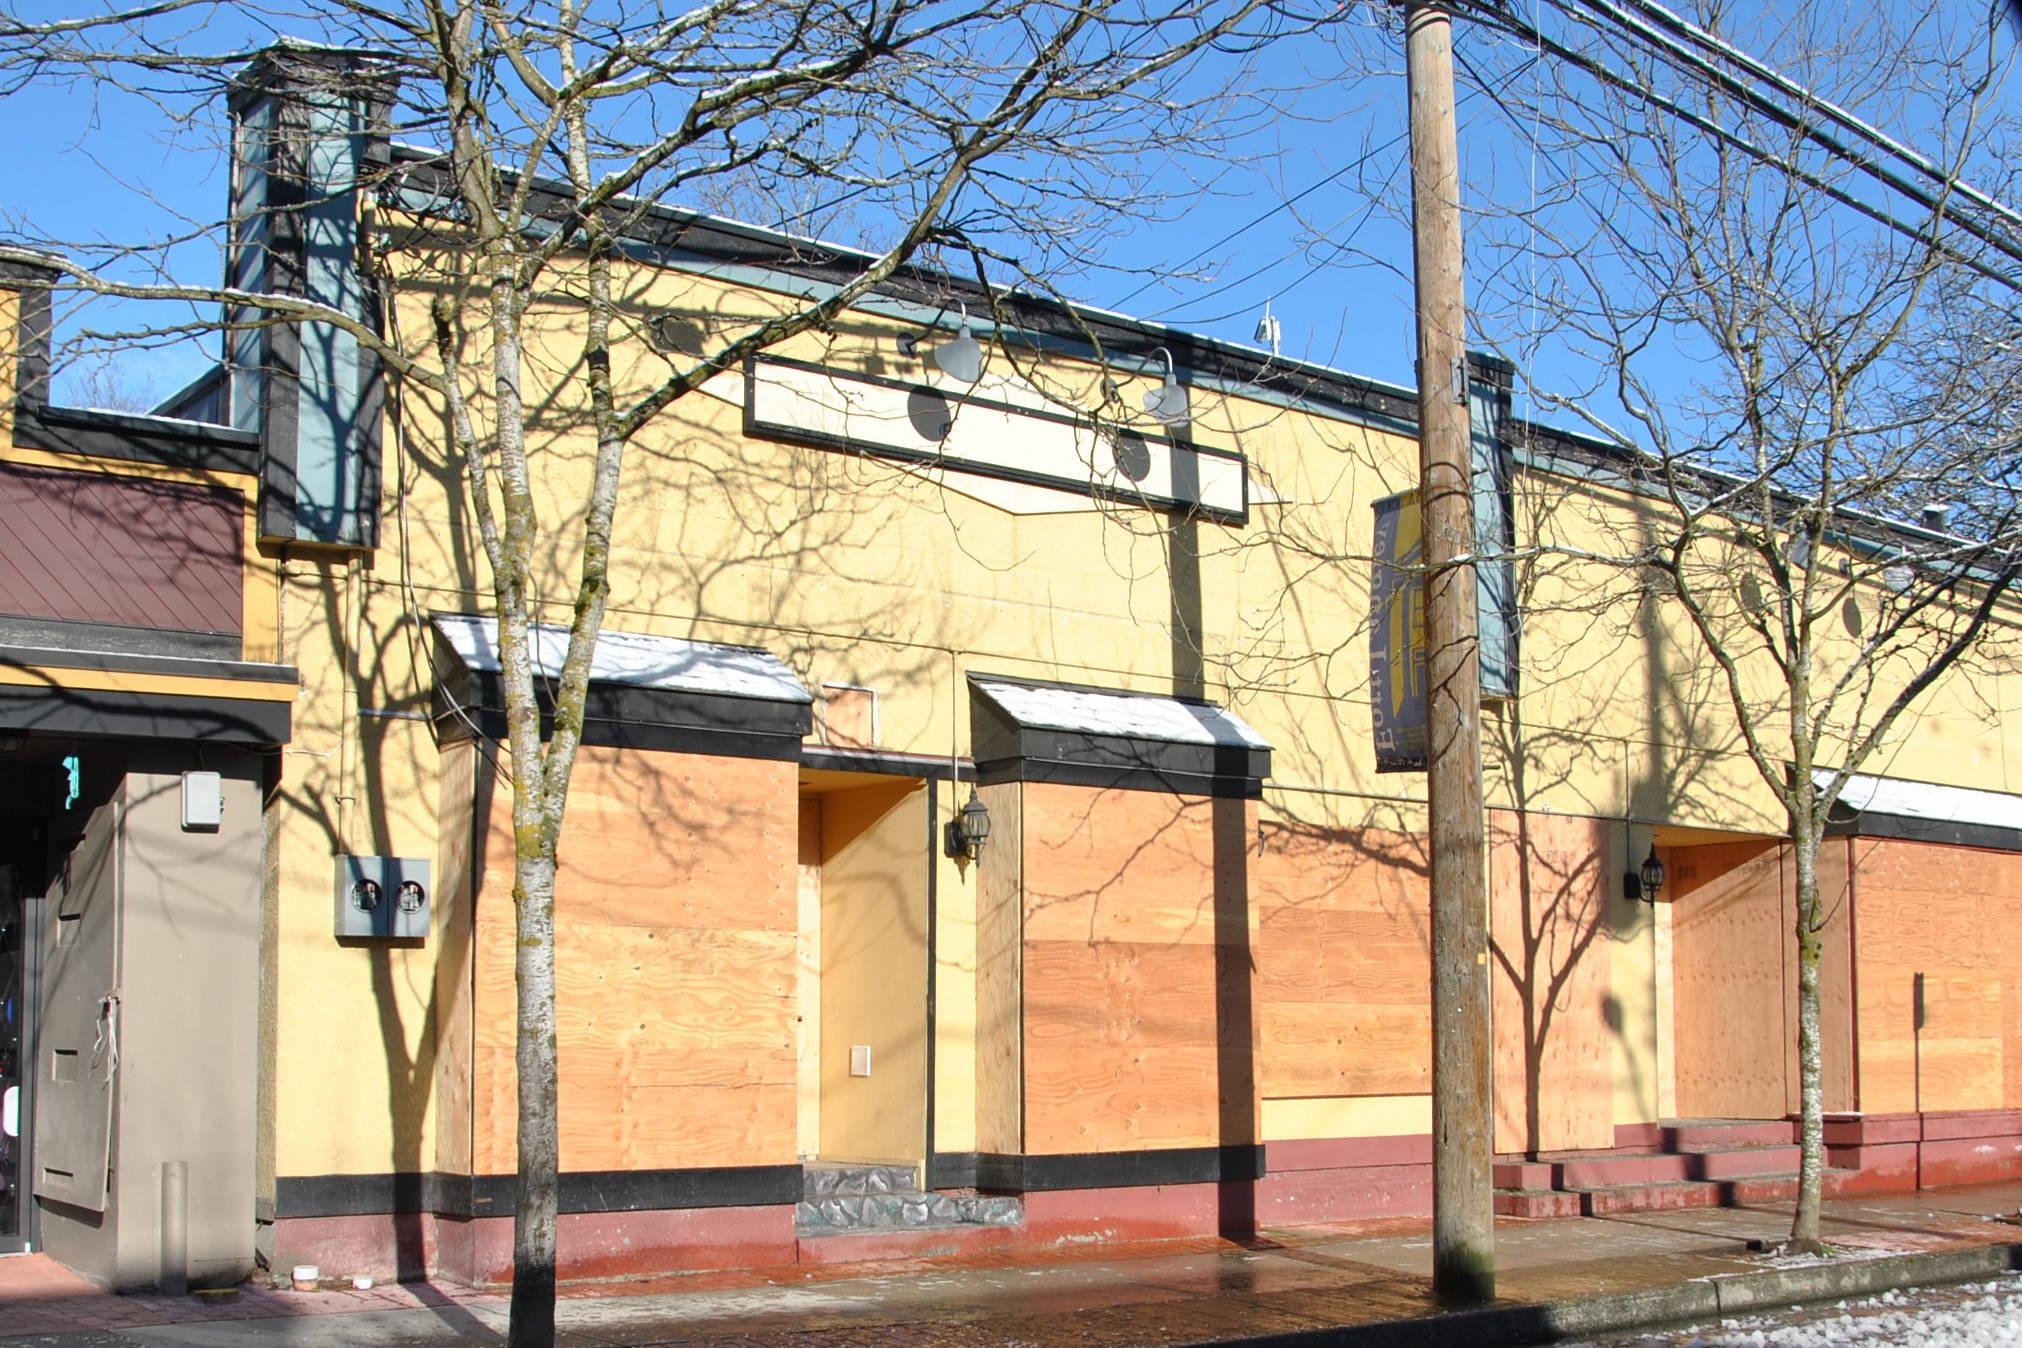 Council, landowner still not talking over vacant Fort Langley buildings